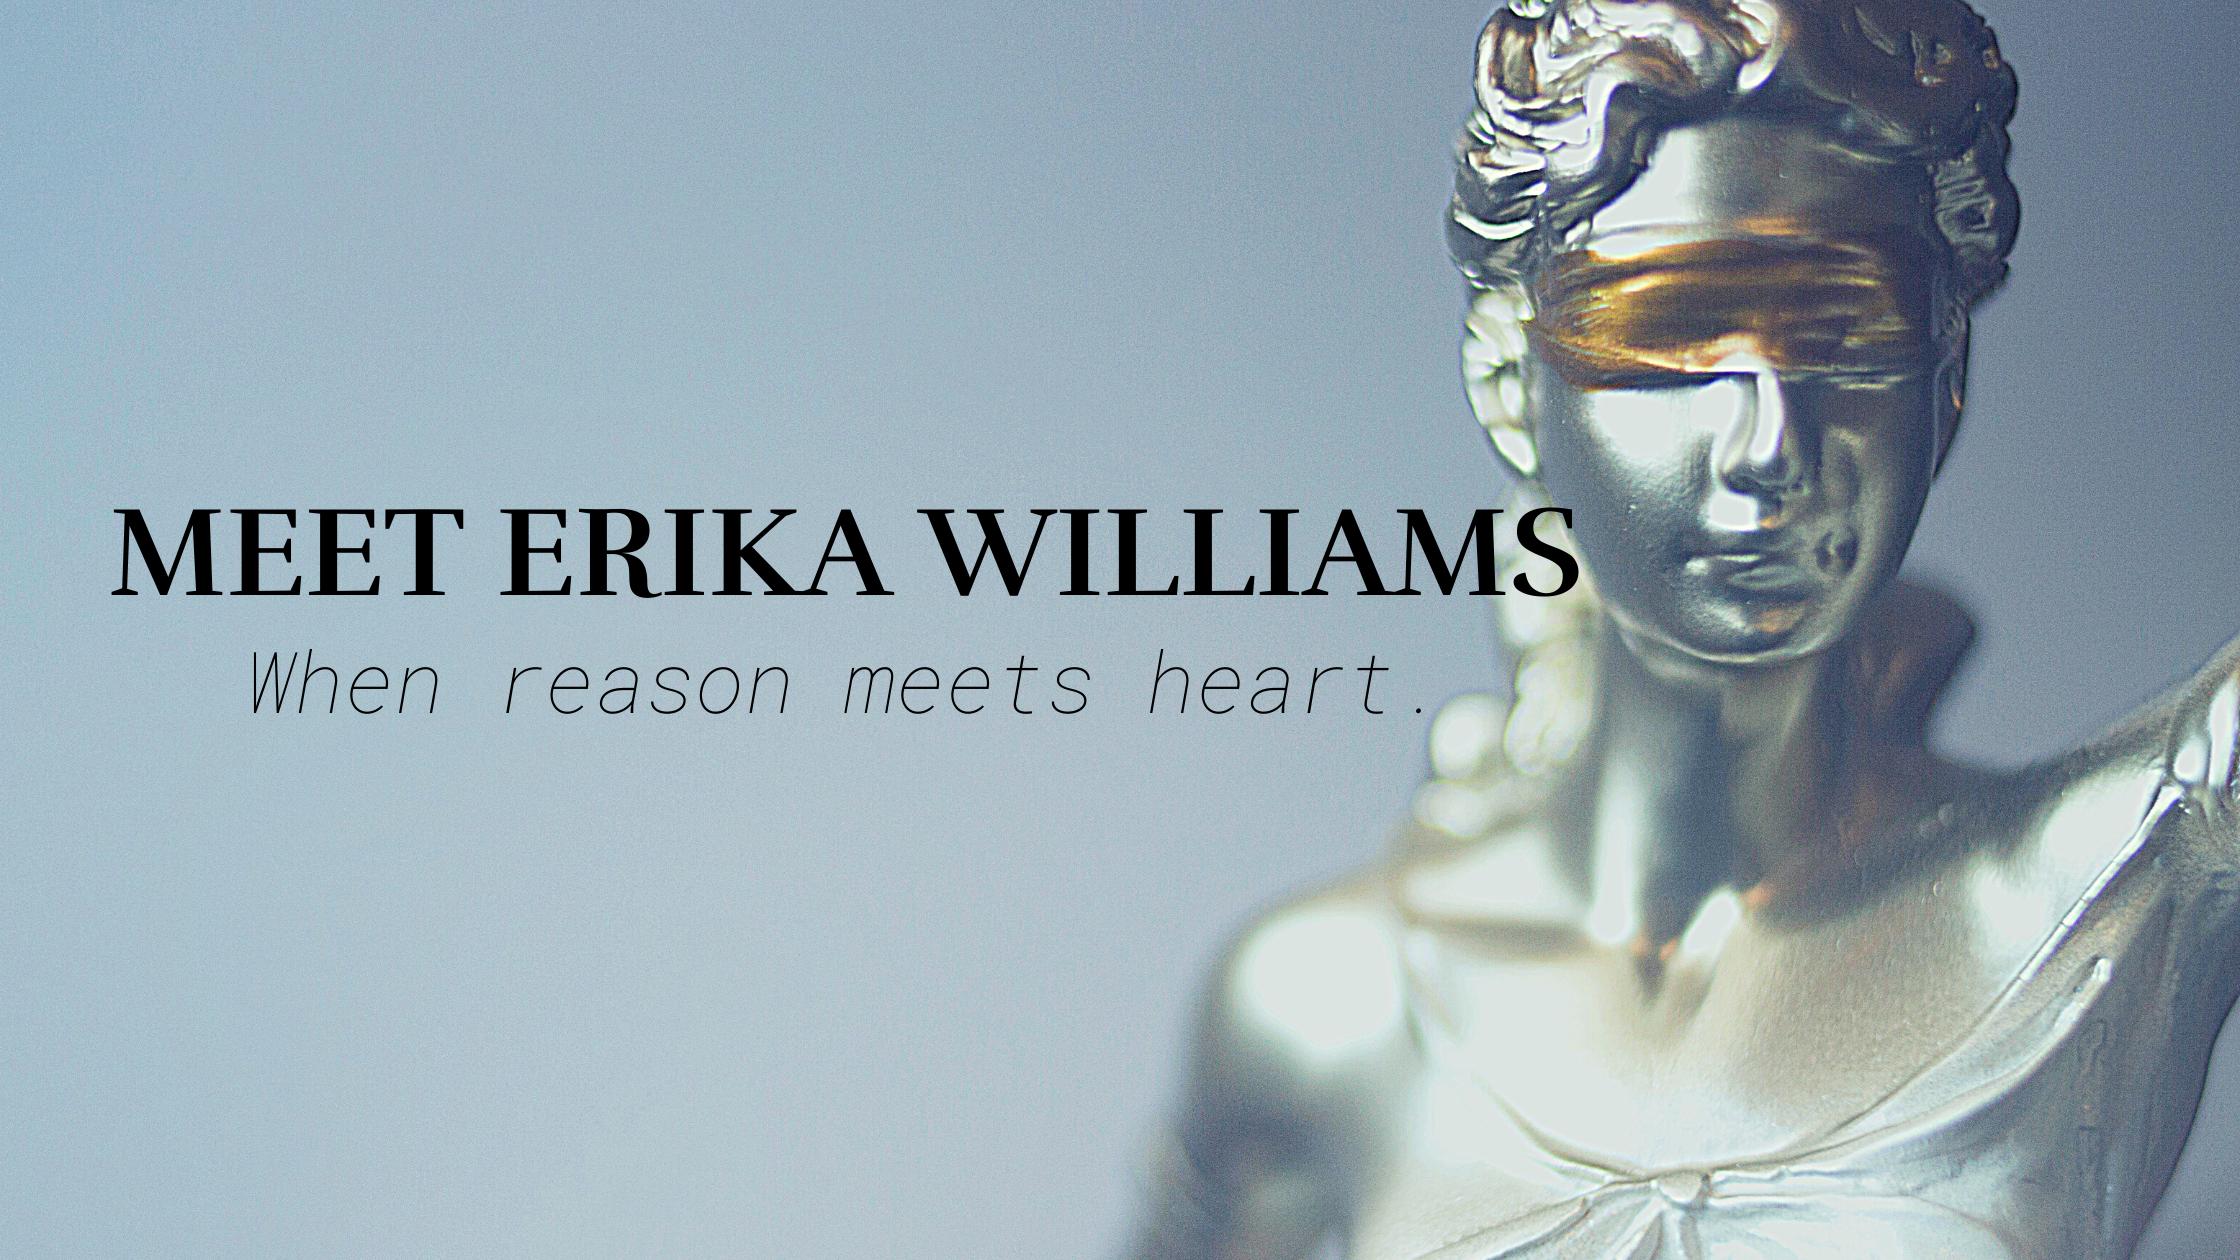 Meet Erika Williams